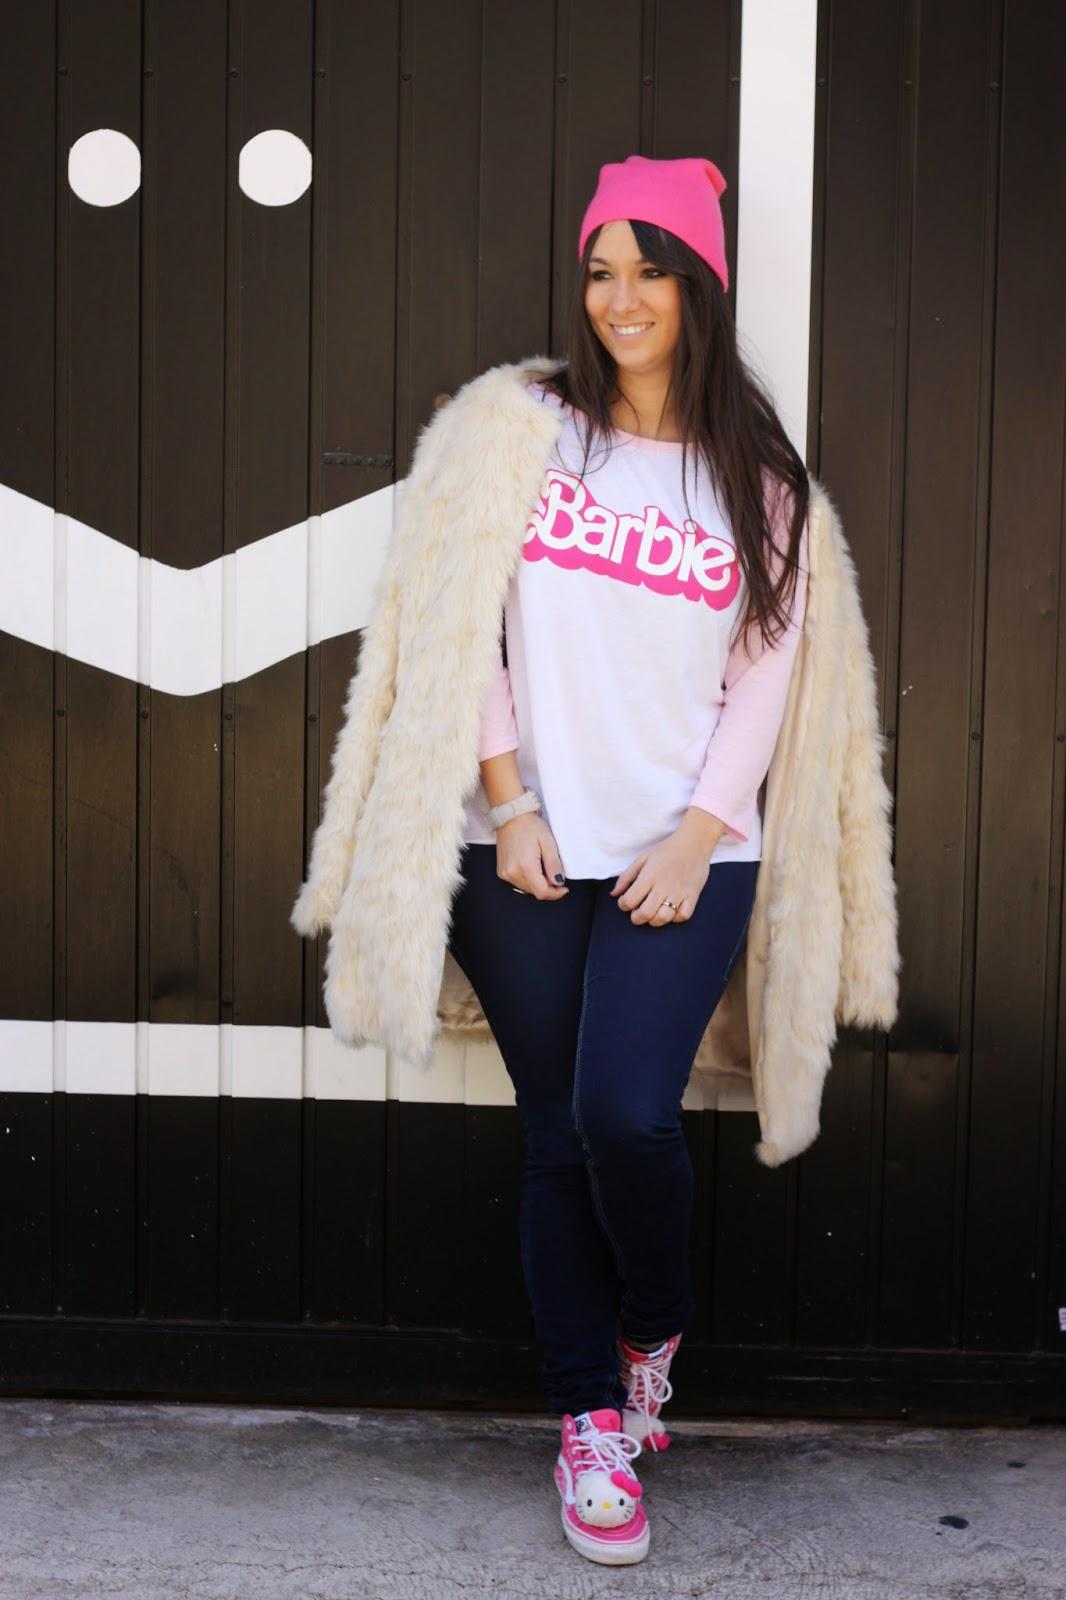 http://silviparalasamigas.blogspot.com.es/2015/02/camiseta-barbie.html